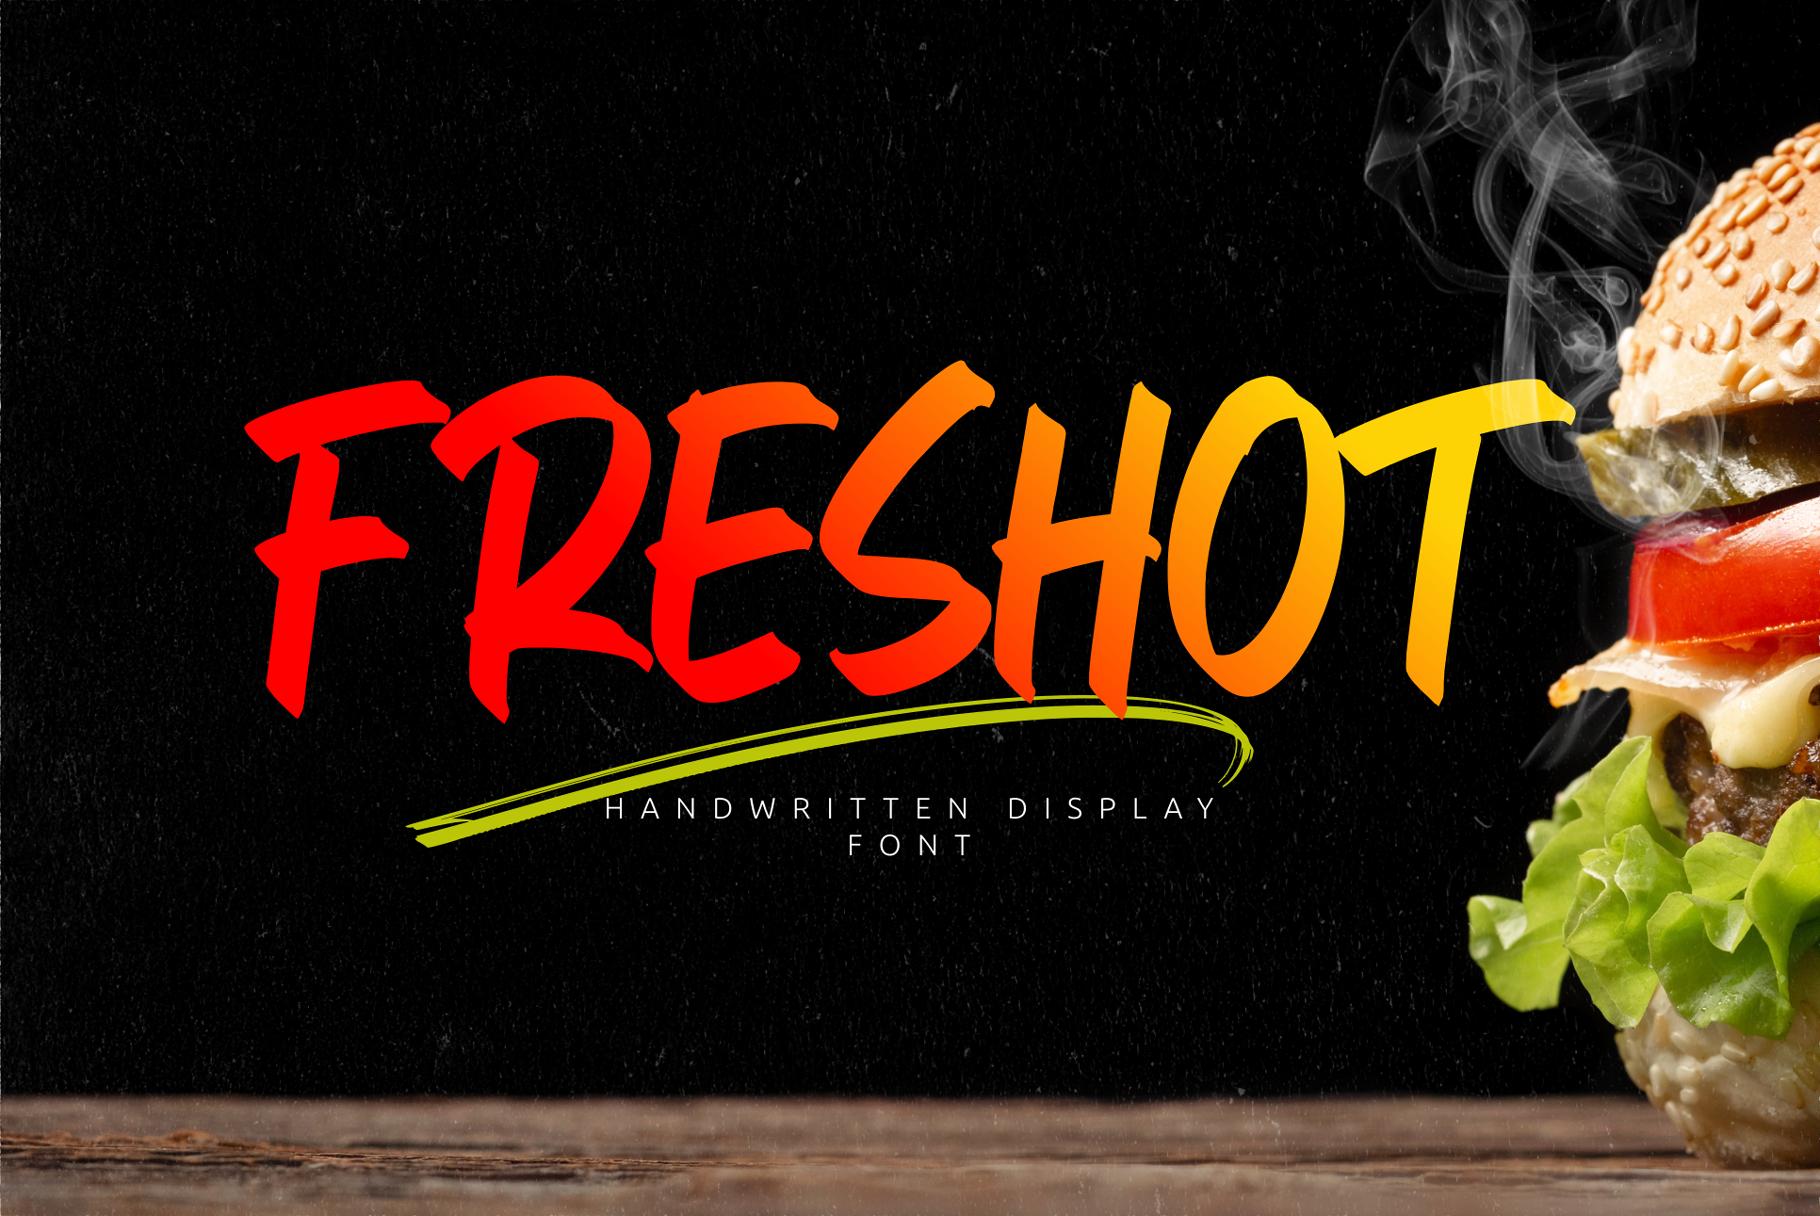 FresHot - Handwritten Display Font example image 1